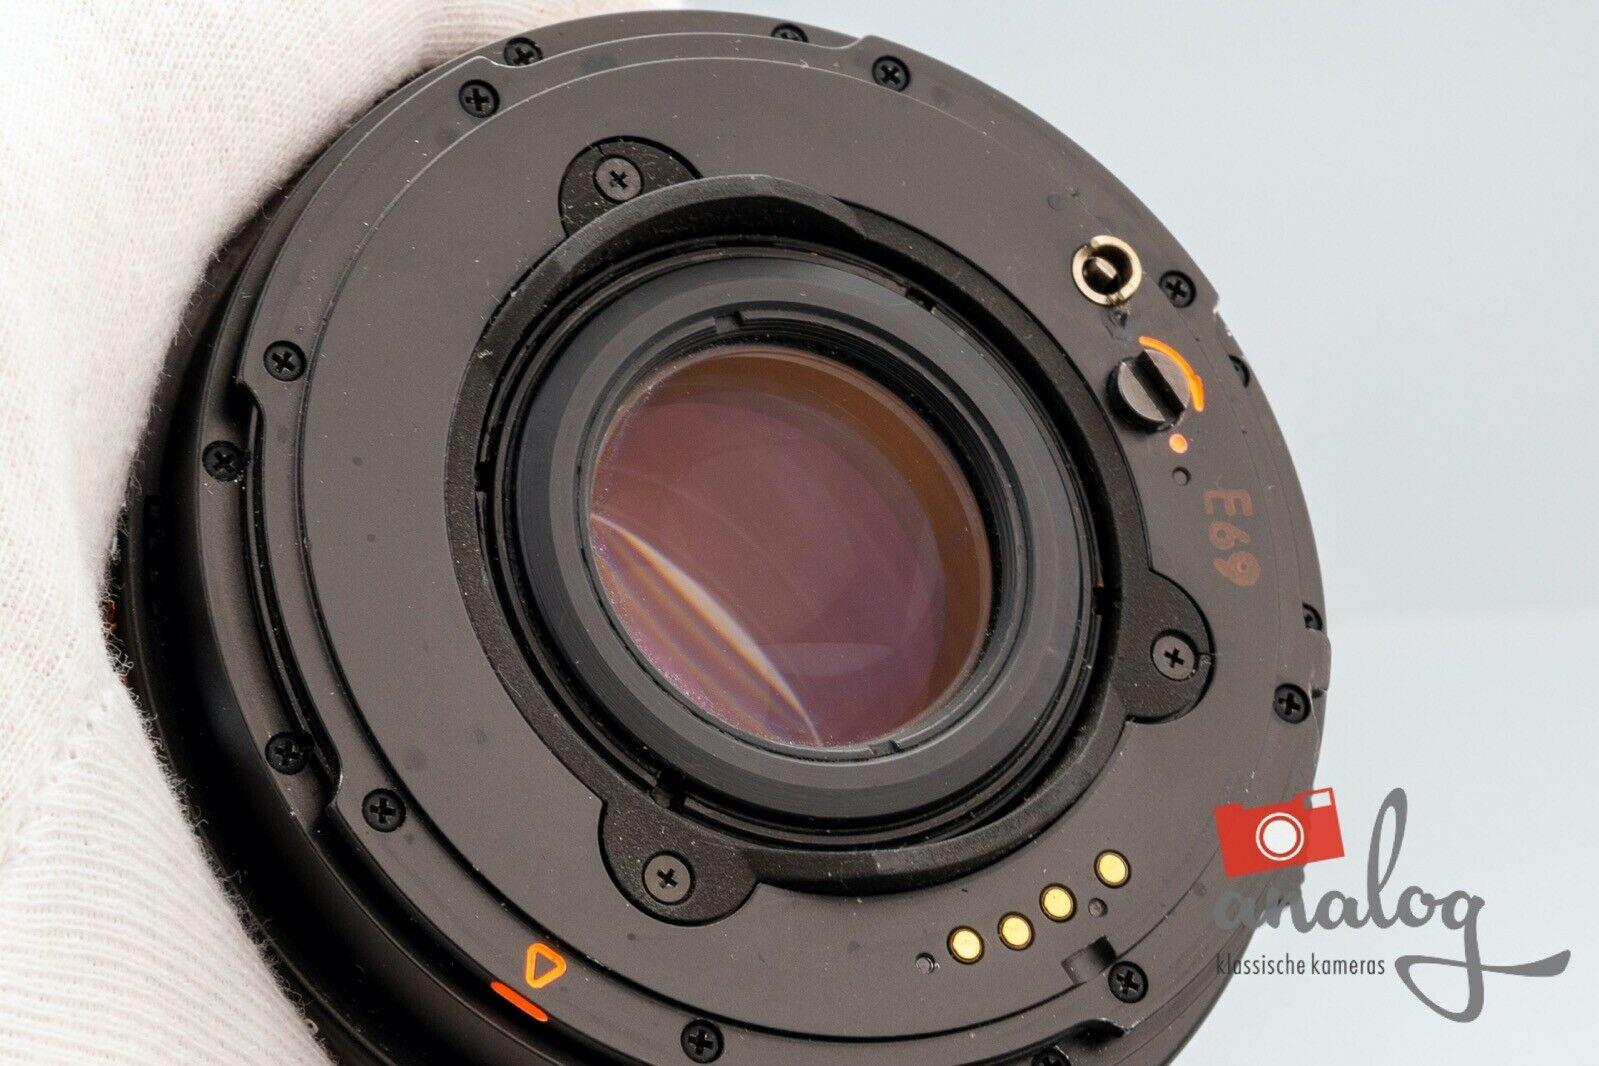 Hasselblad Carl Zeiss Distagon F 50mm 2.8